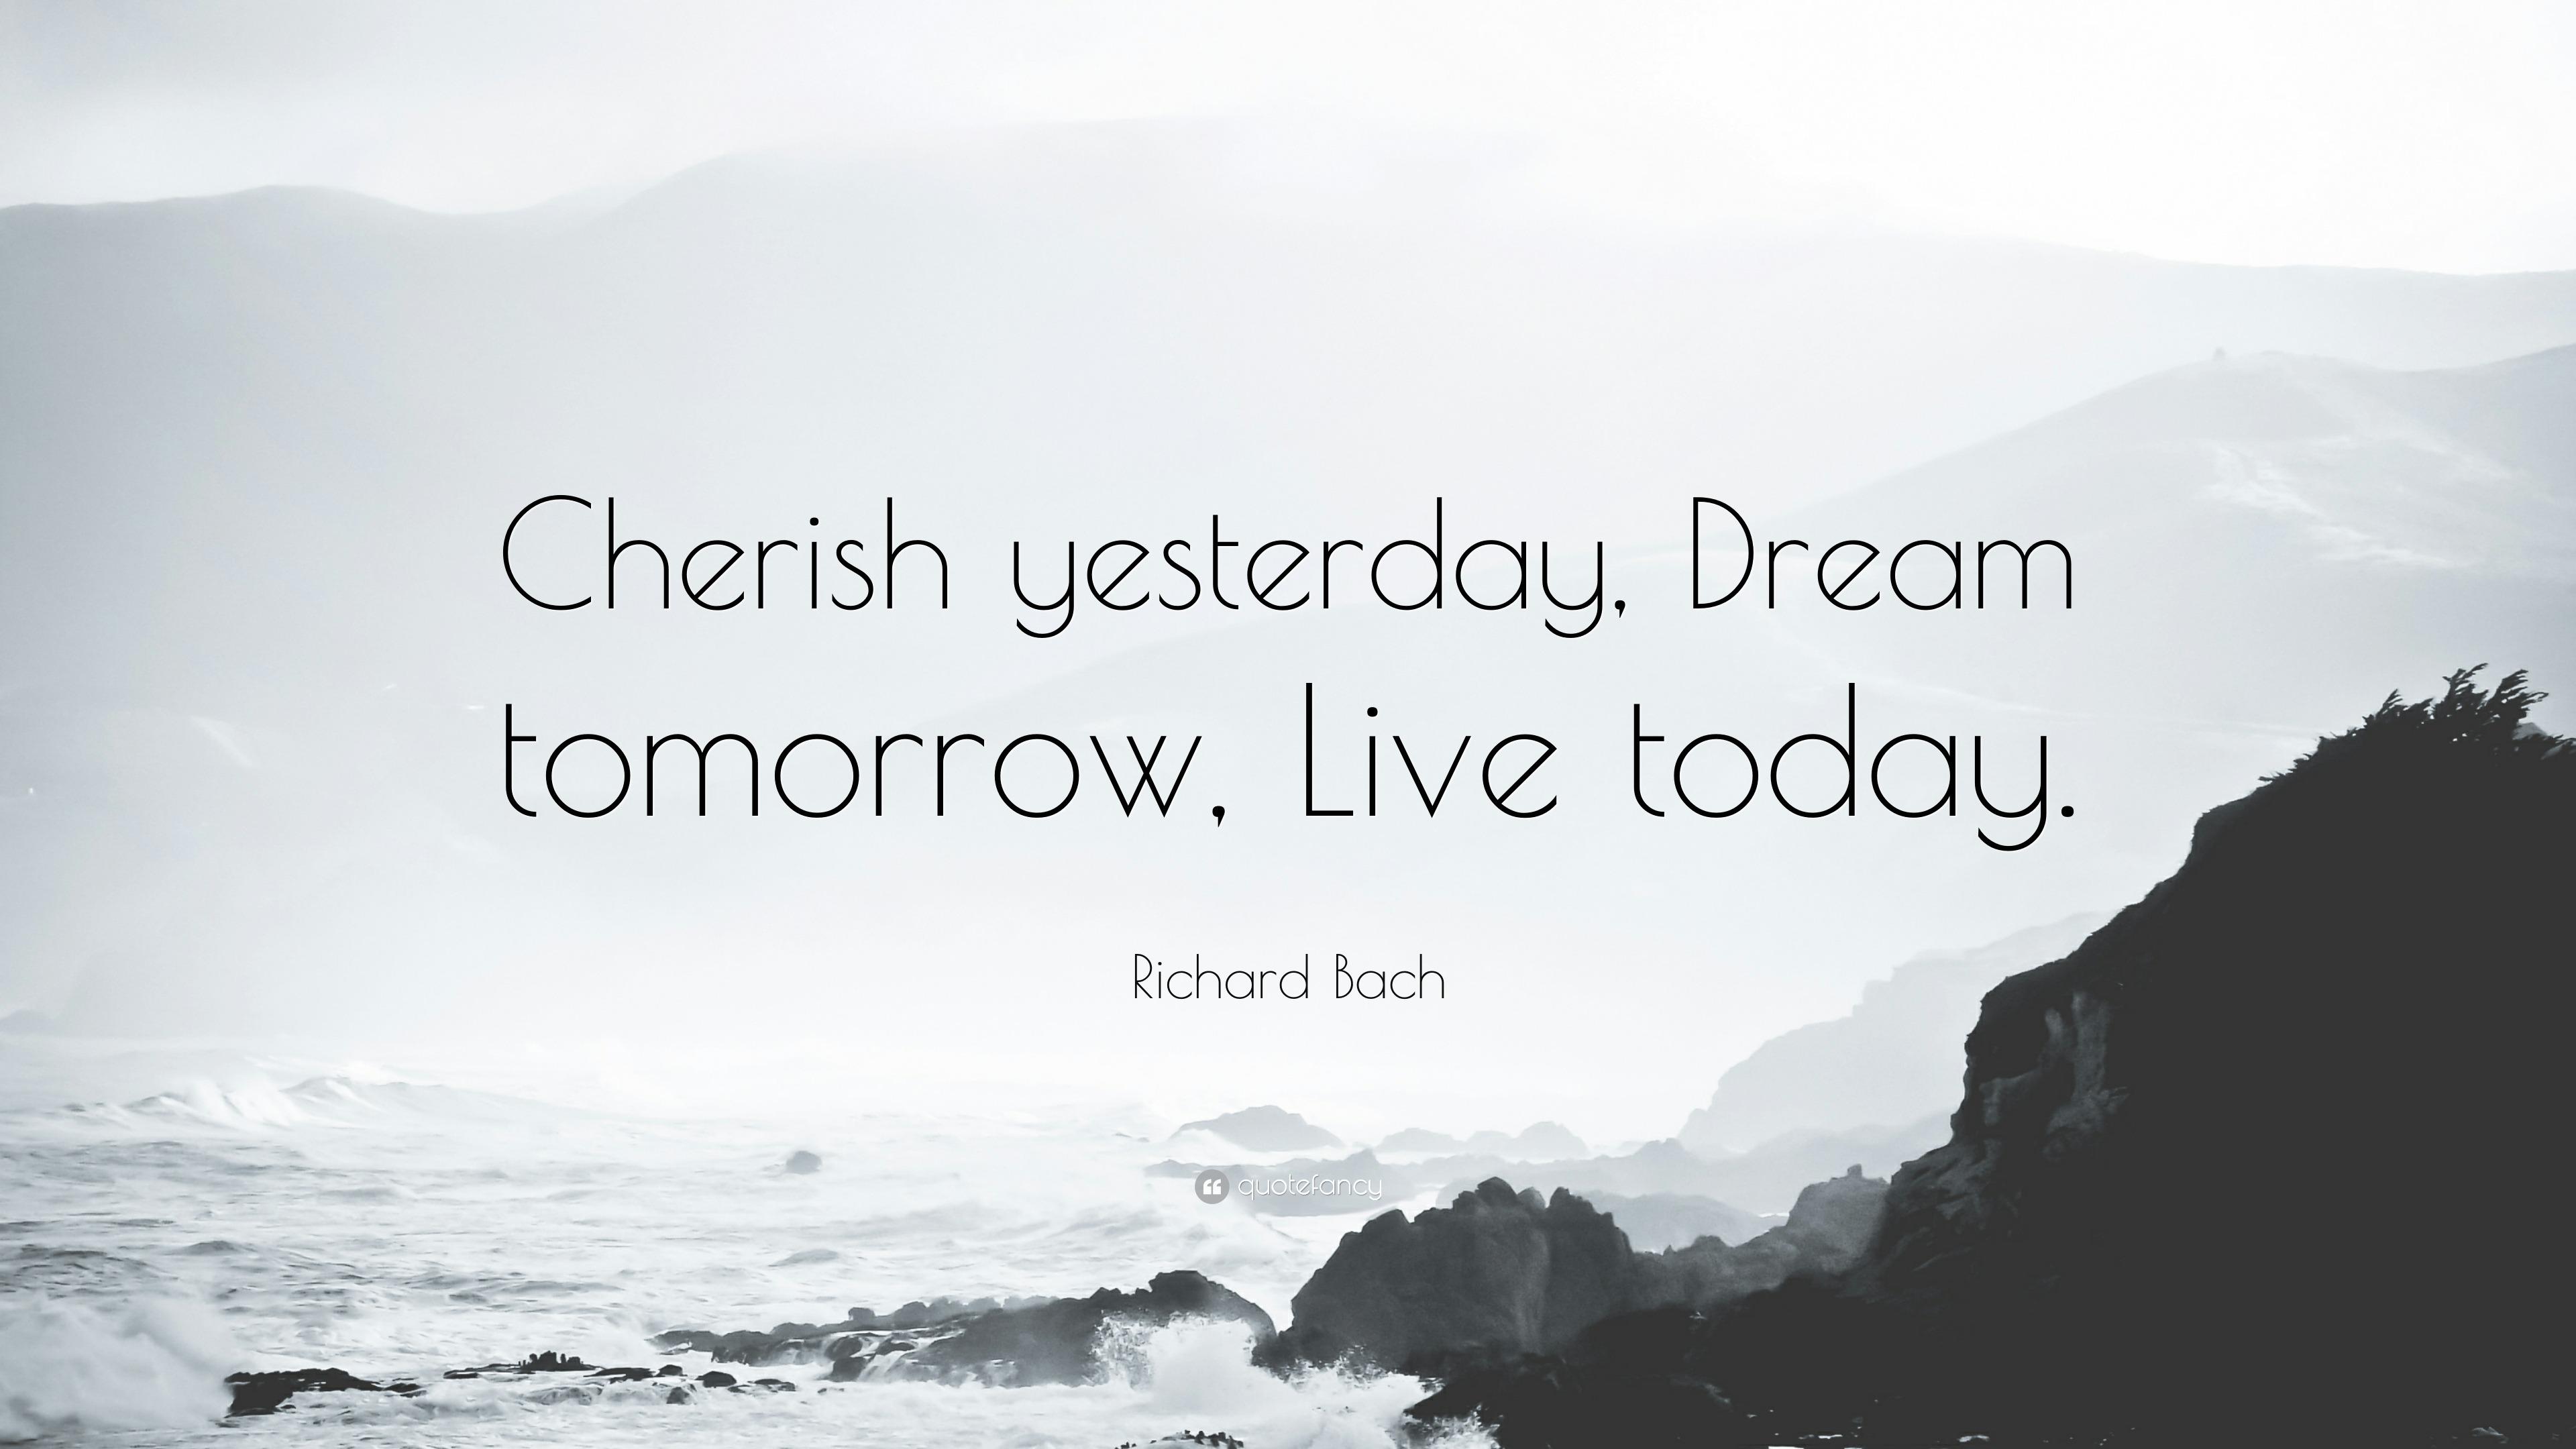 Richard Bach Quote: Cherish yesterday, Dream tomorrow